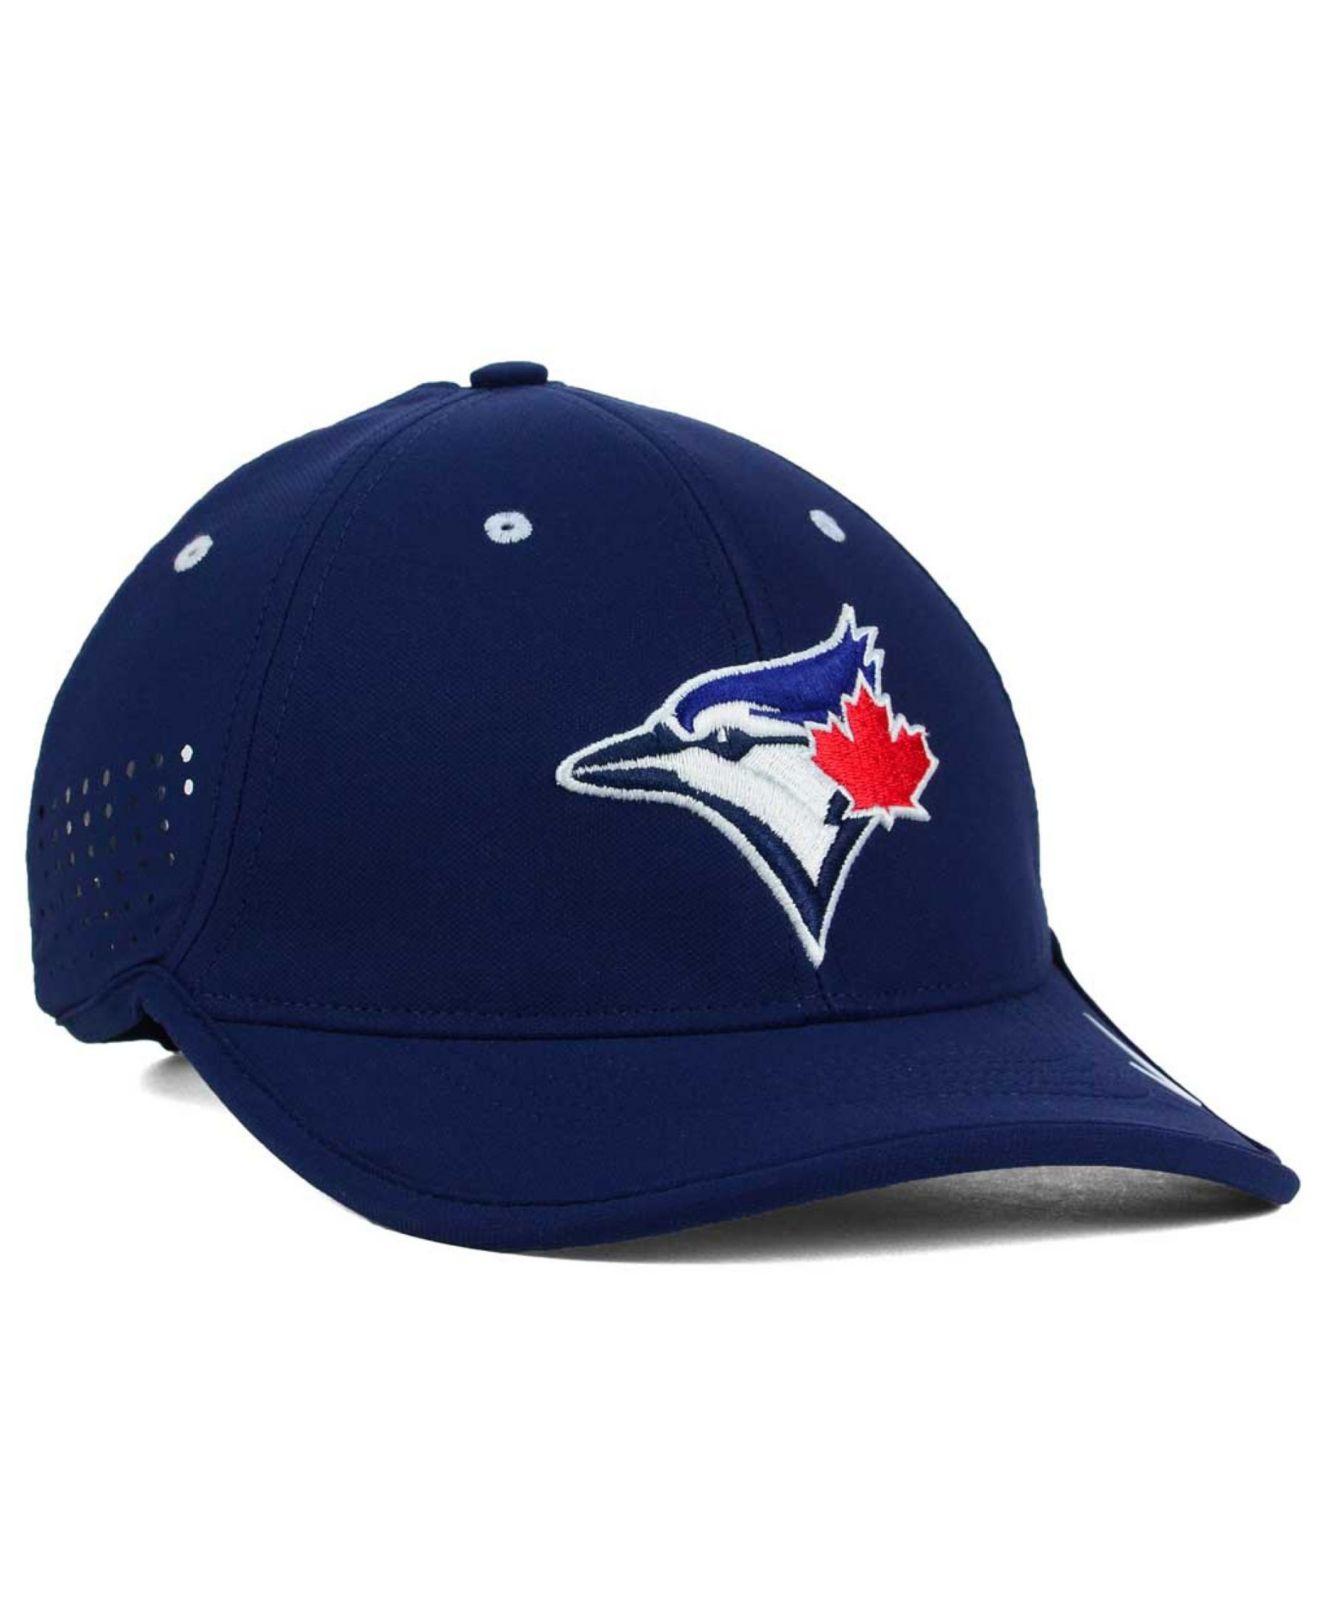 f4265d05712 ... canada lyst nike toronto blue jays vapor swoosh adjustable cap in red  for men 5395d bd469